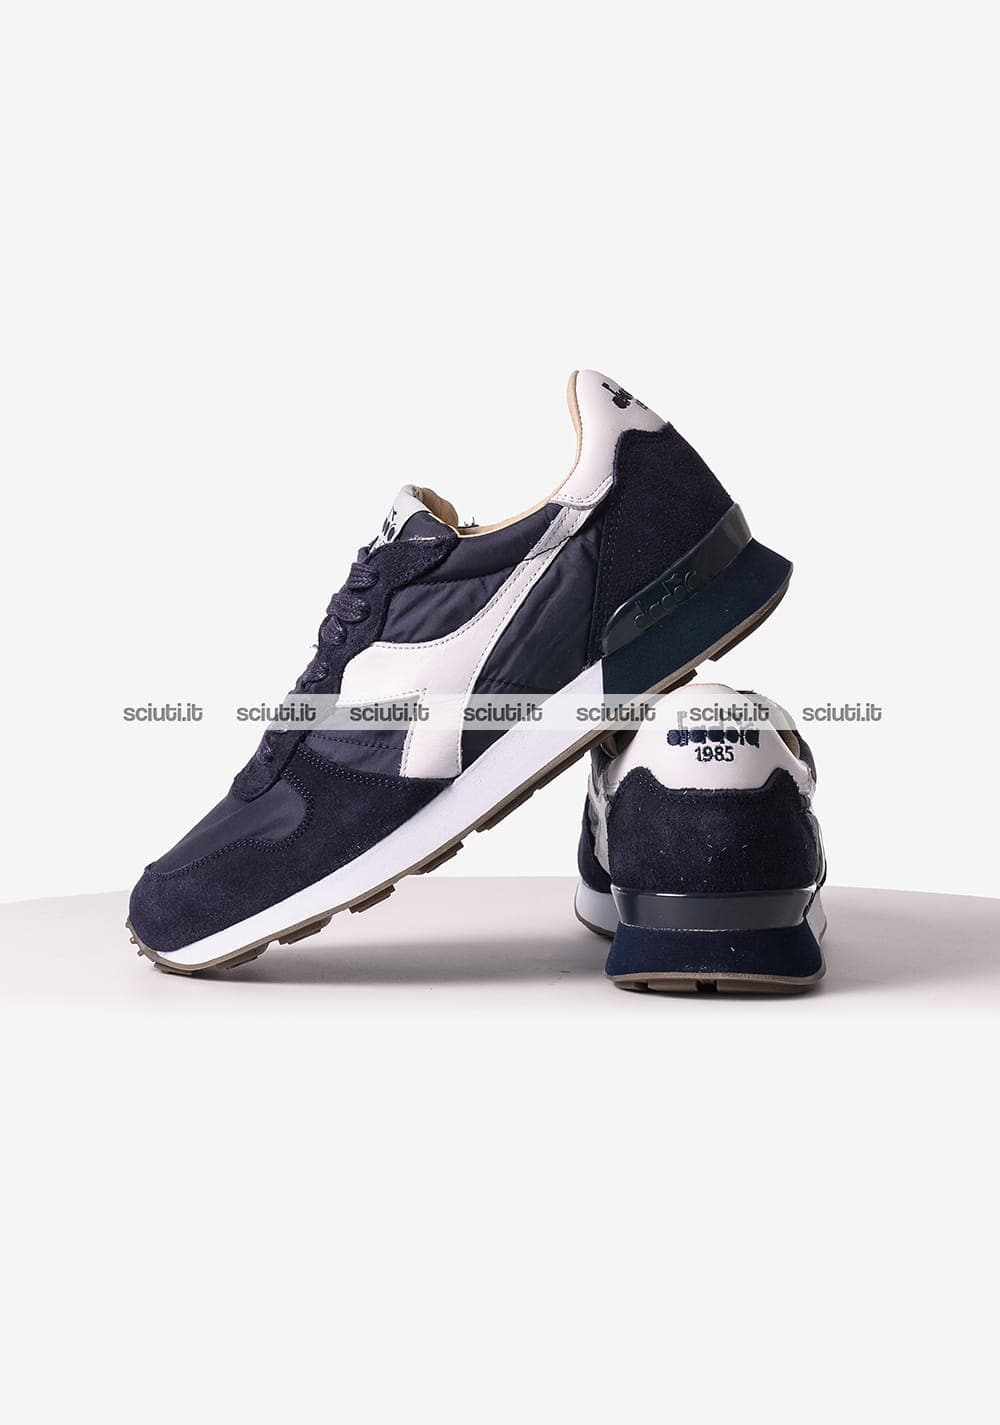 diadora e adidas scarpe uomo